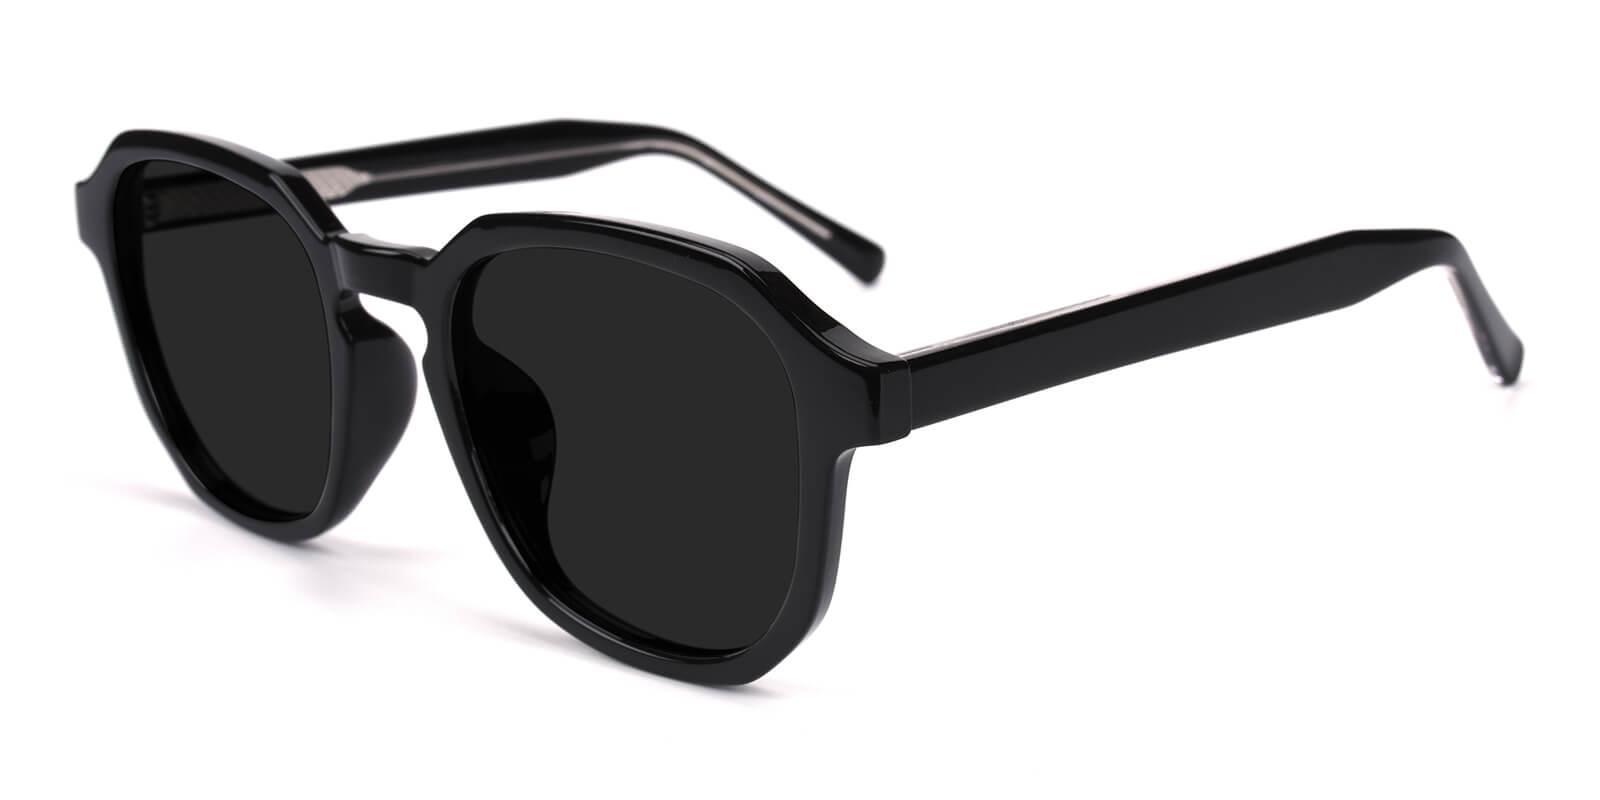 Polly-Black-Square-Acetate-Eyeglasses-additional1